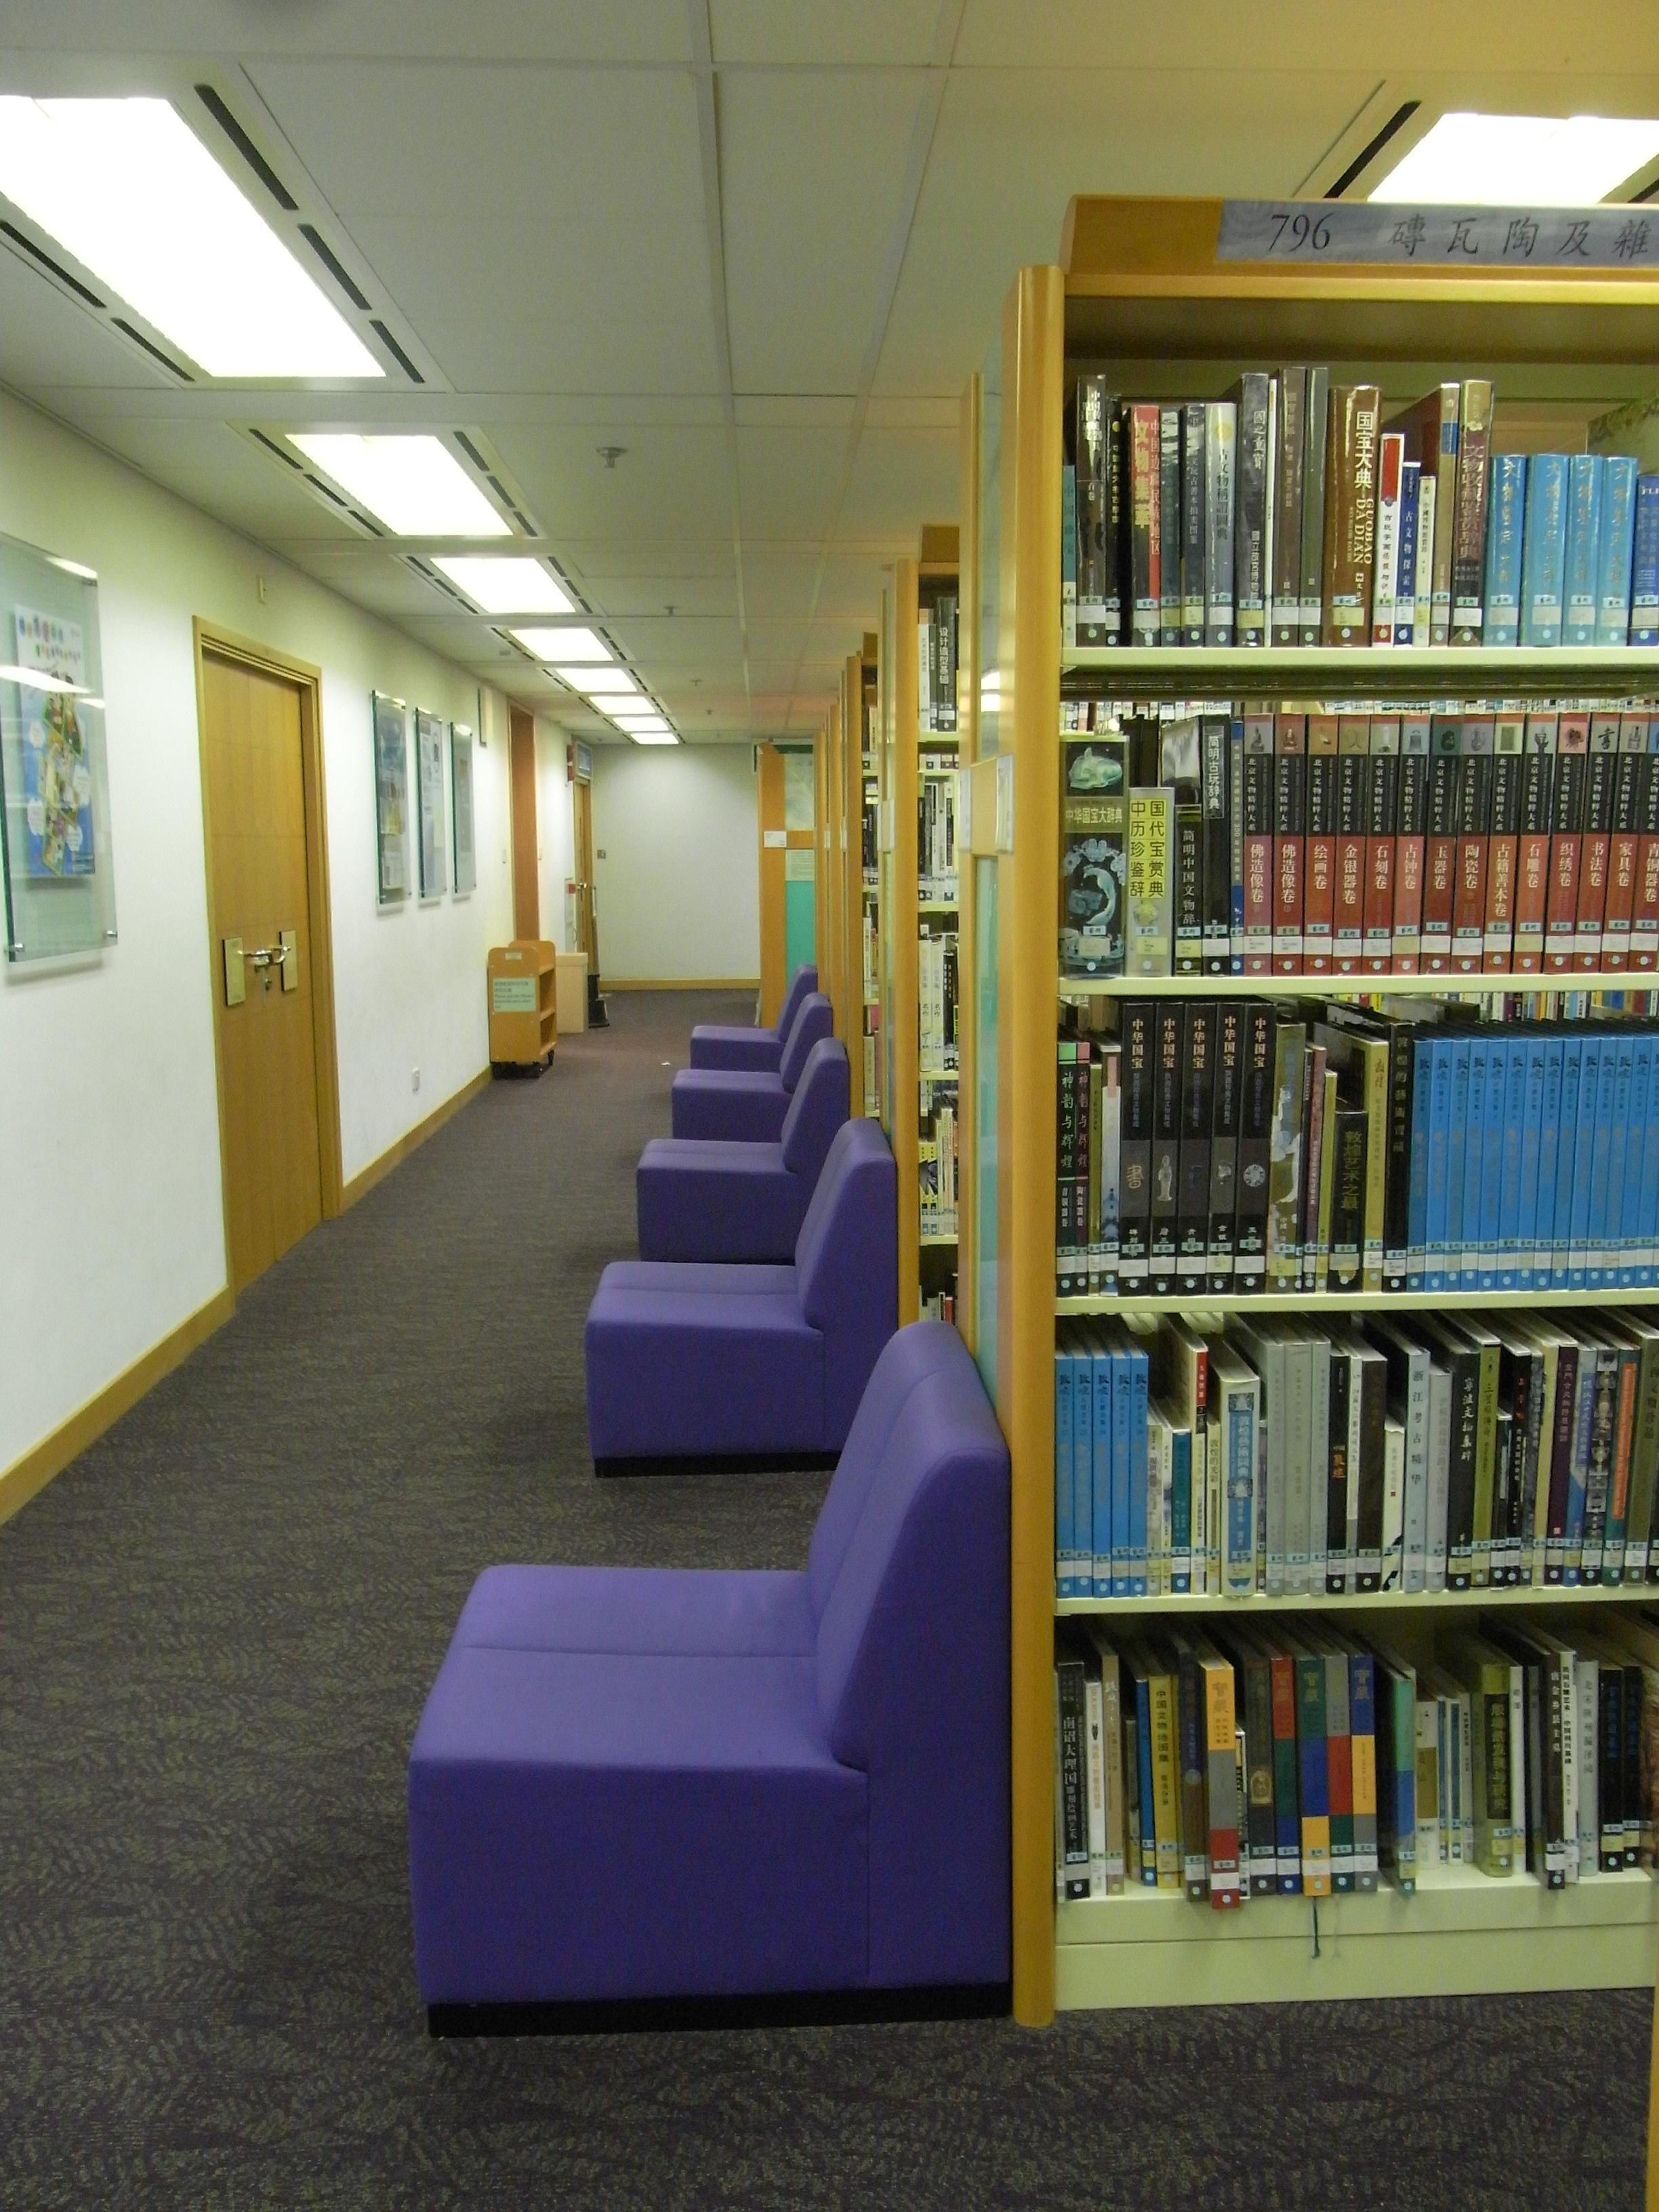 File:HK 香港中央圖書館 Central Library 10th Floor Interior Corridor Sofa In Purple